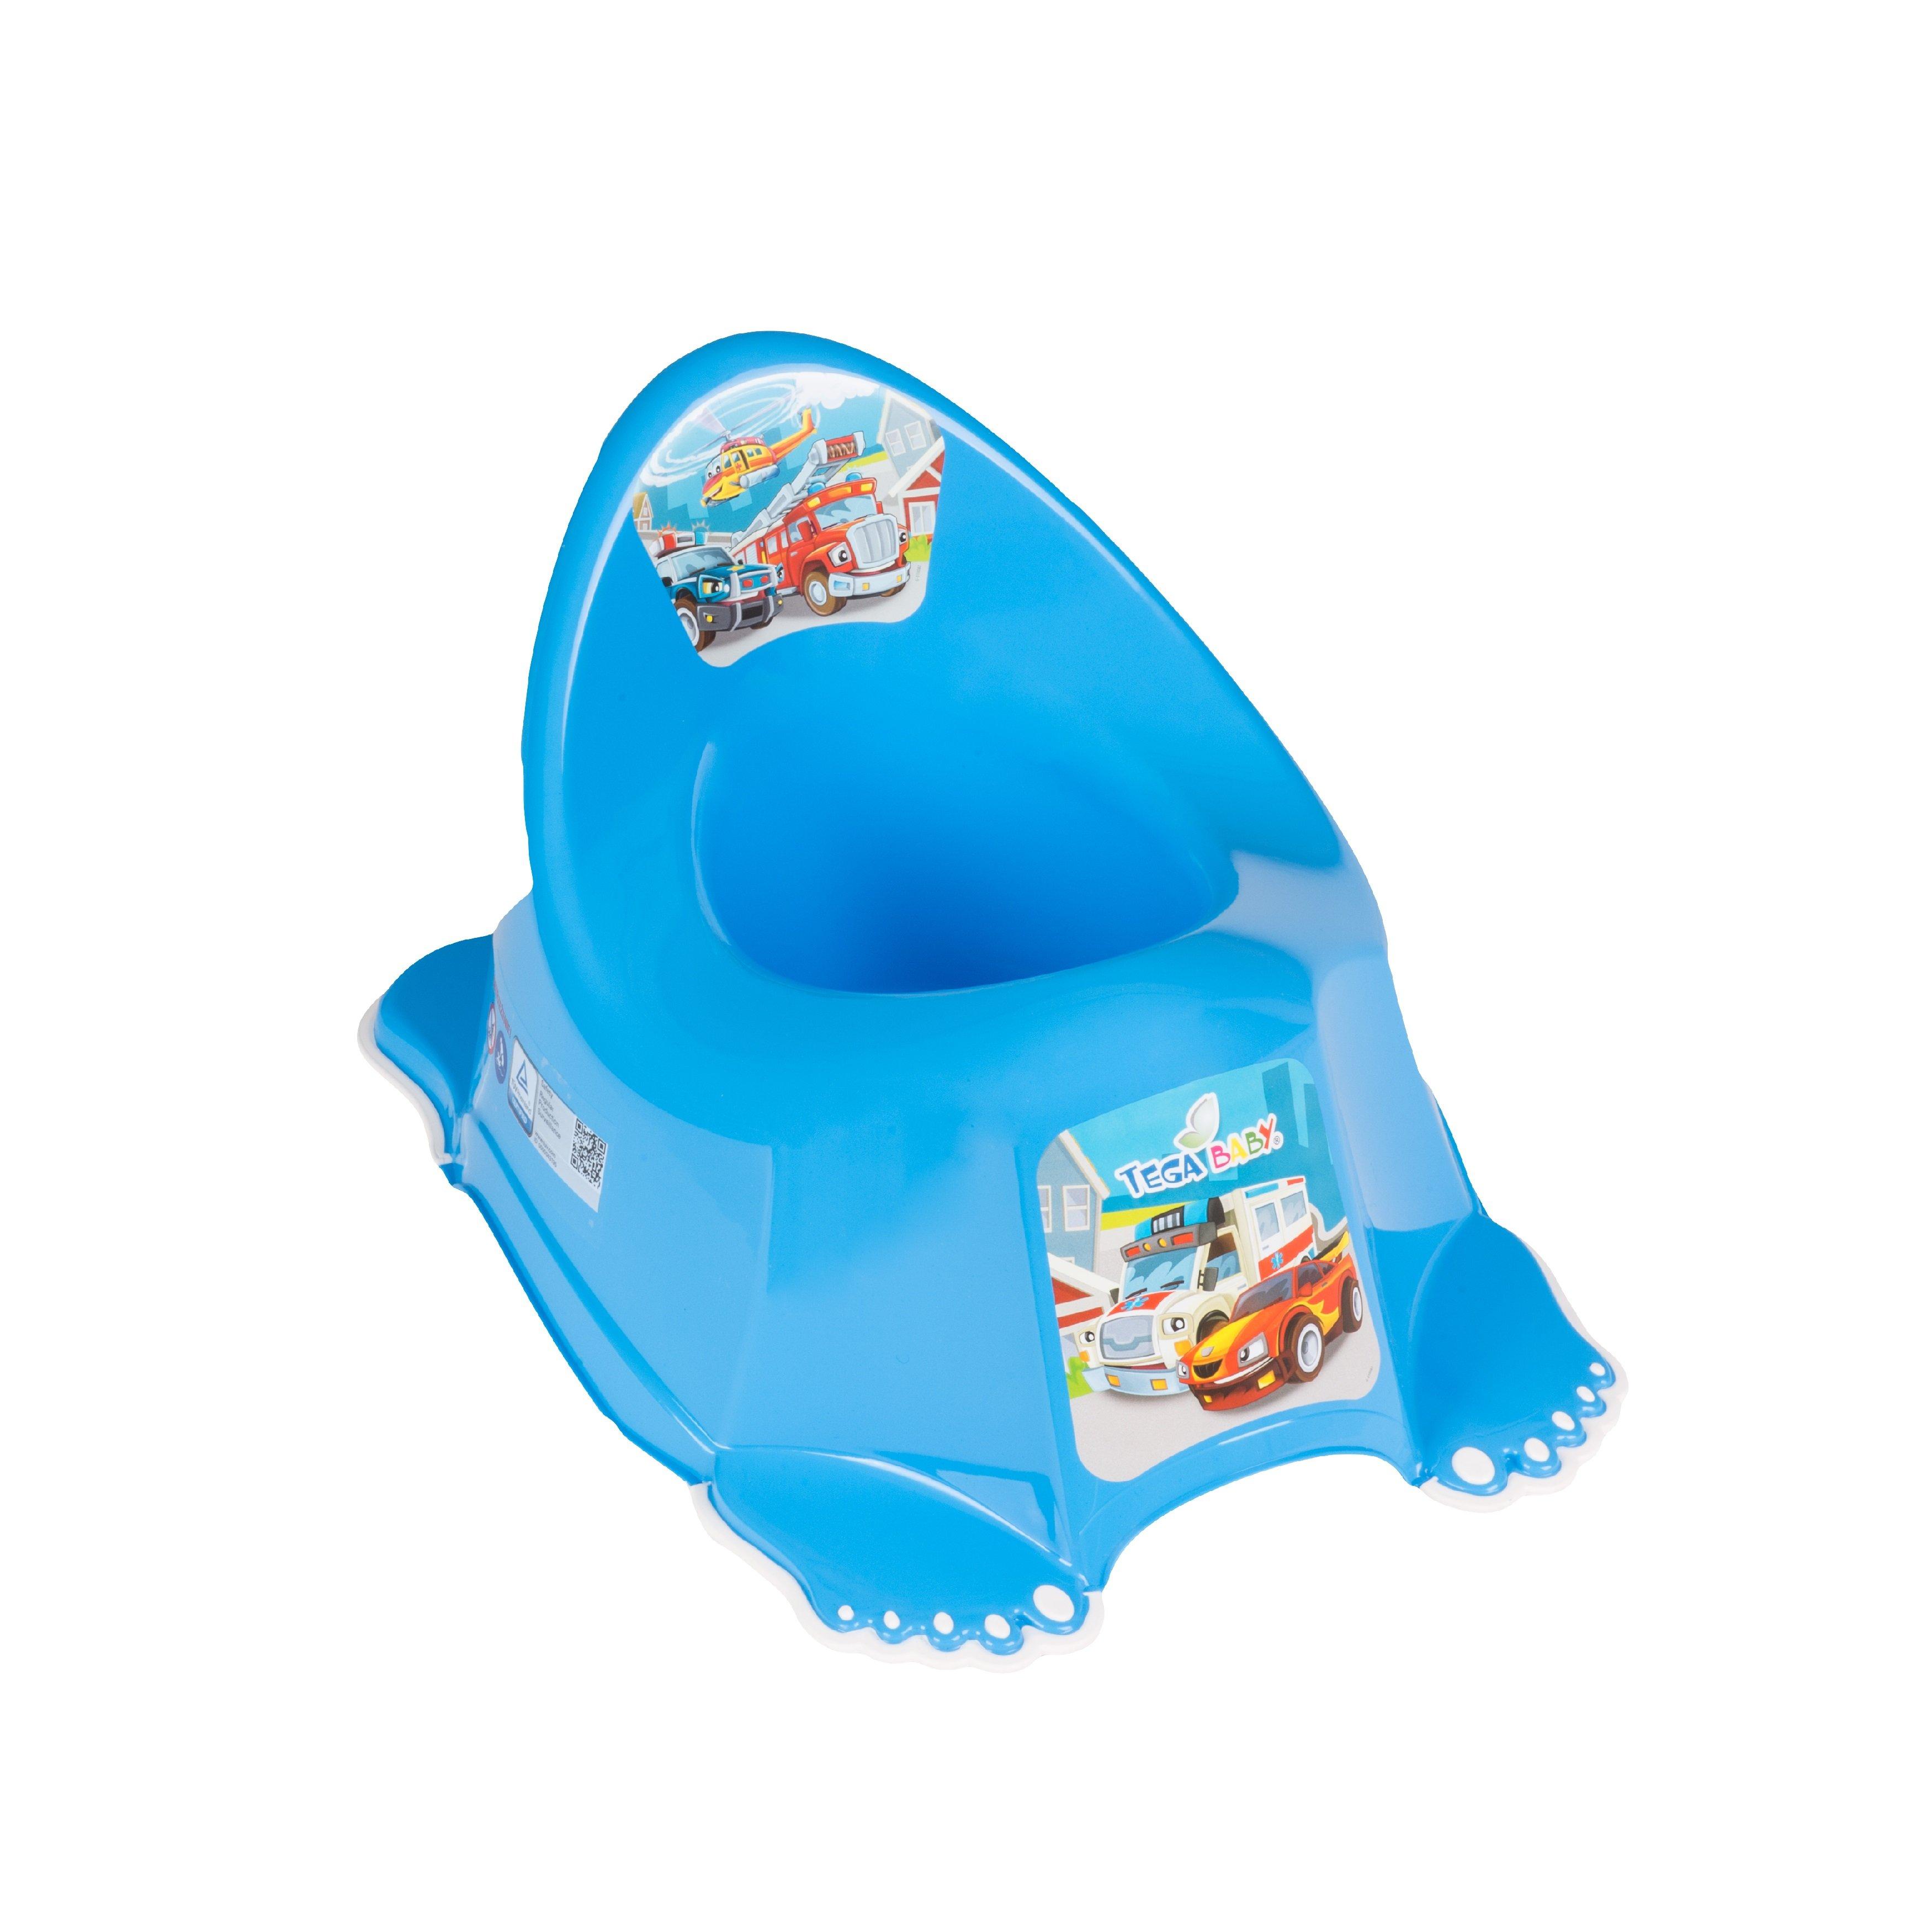 Bērnu podiņš TegaBaby CARS blue